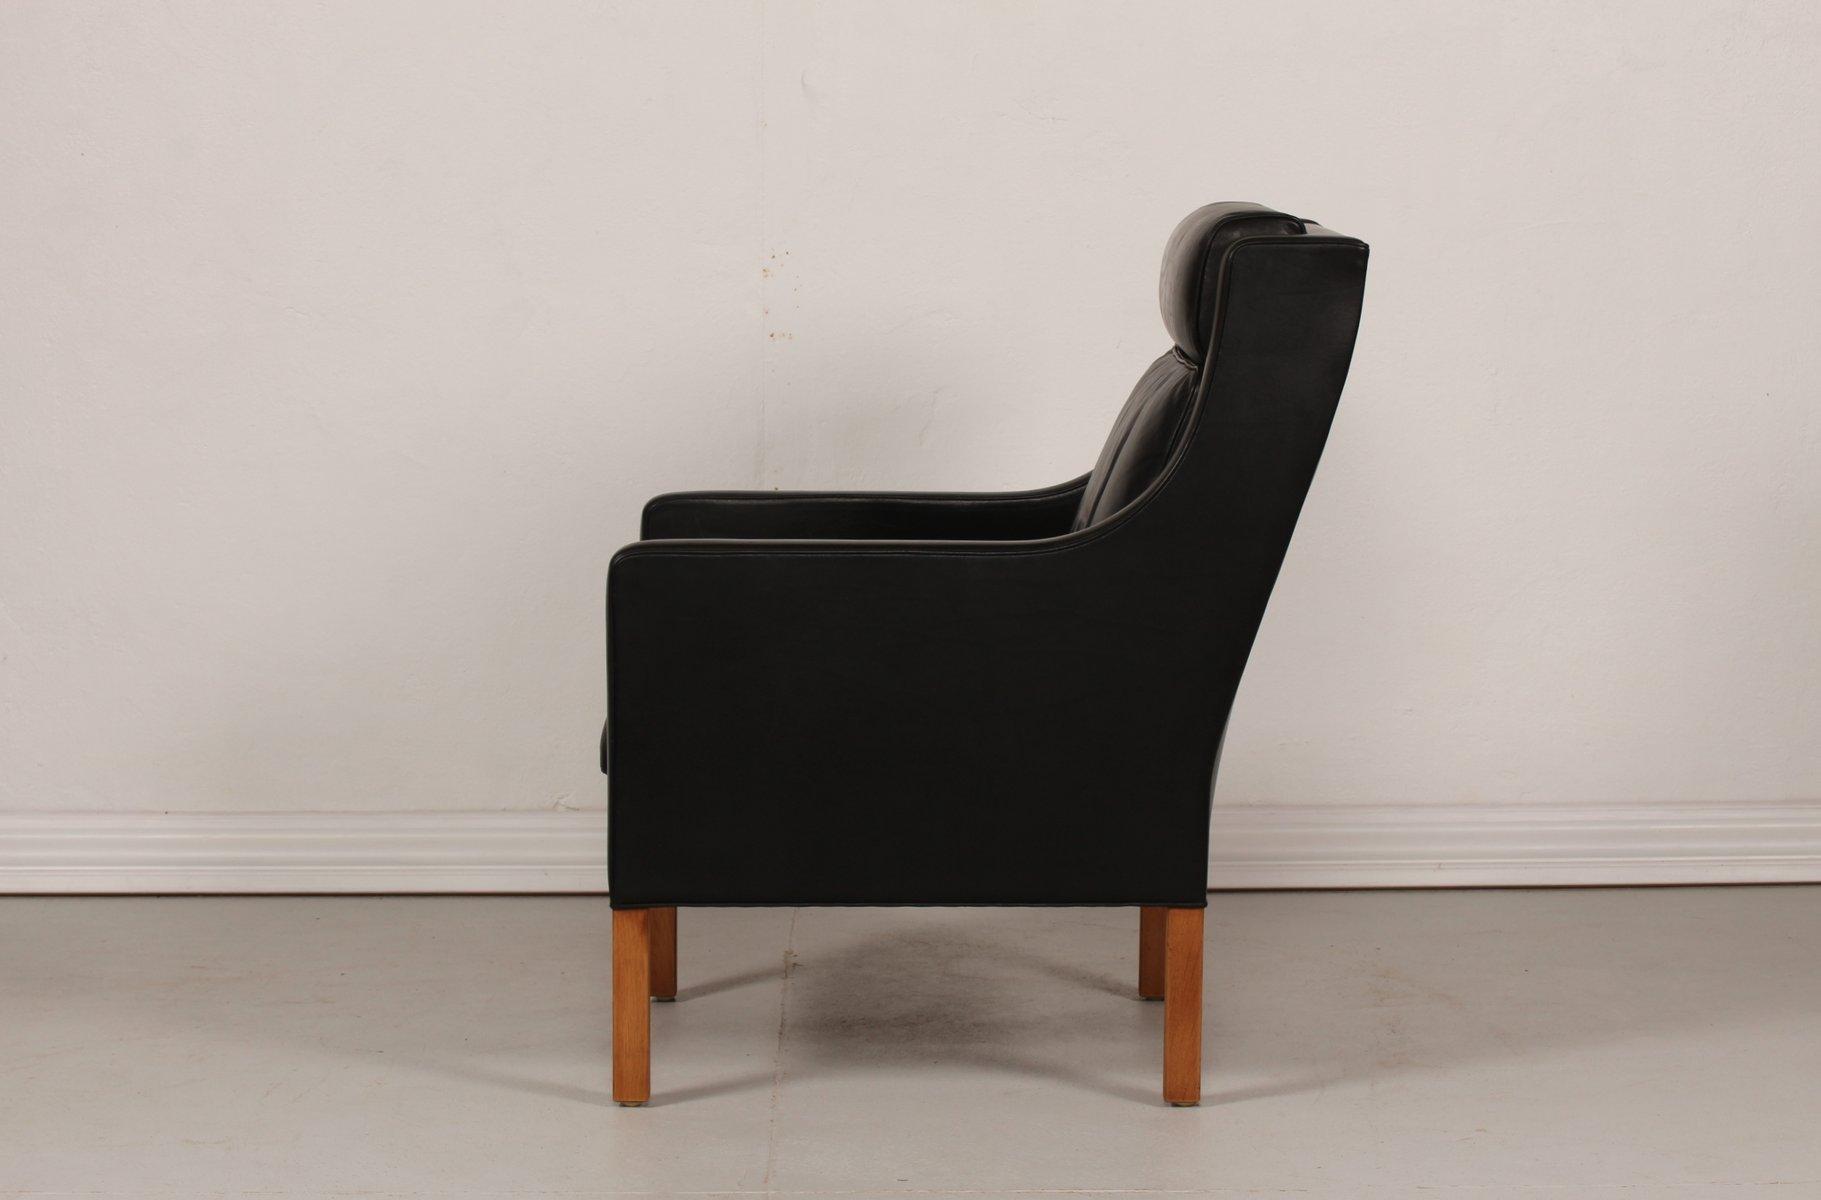 d nischer schwarzer leder eichenholz 2431 modell wing stuhl von b rge mogensen f r fredericia. Black Bedroom Furniture Sets. Home Design Ideas